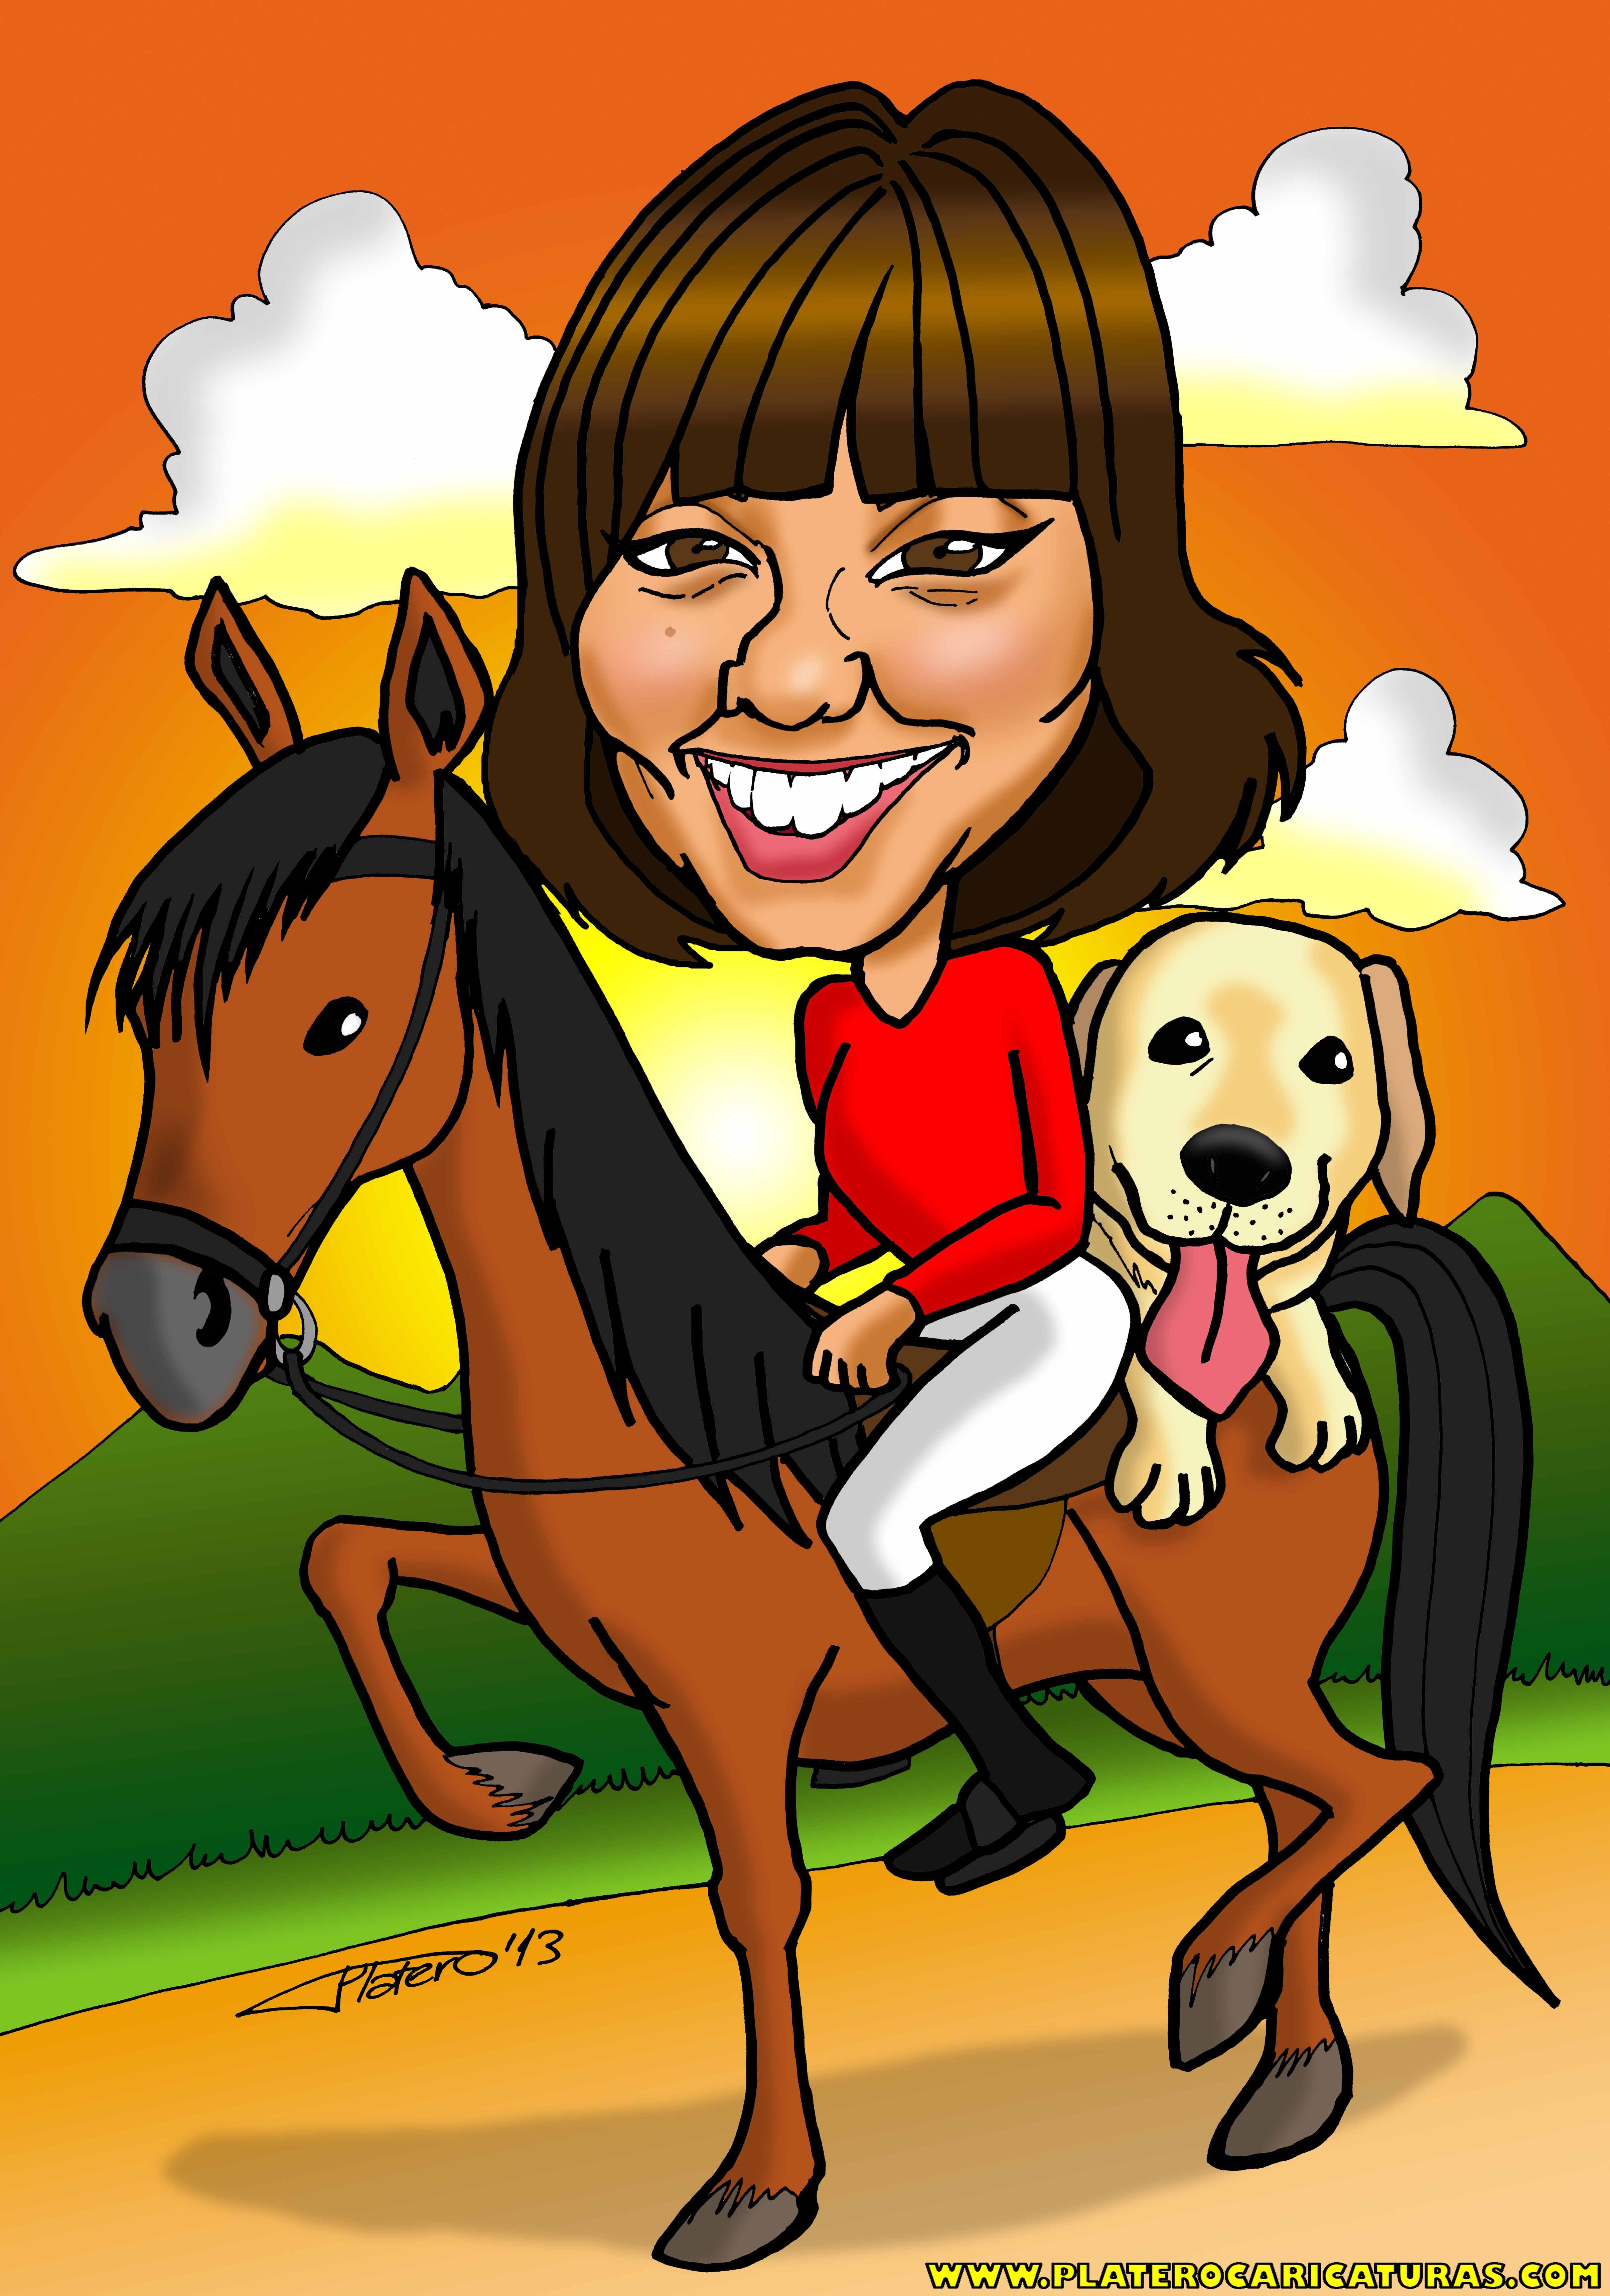 02 caricaturas a color por encargo personalizadas_chica en caballo_platerocarica